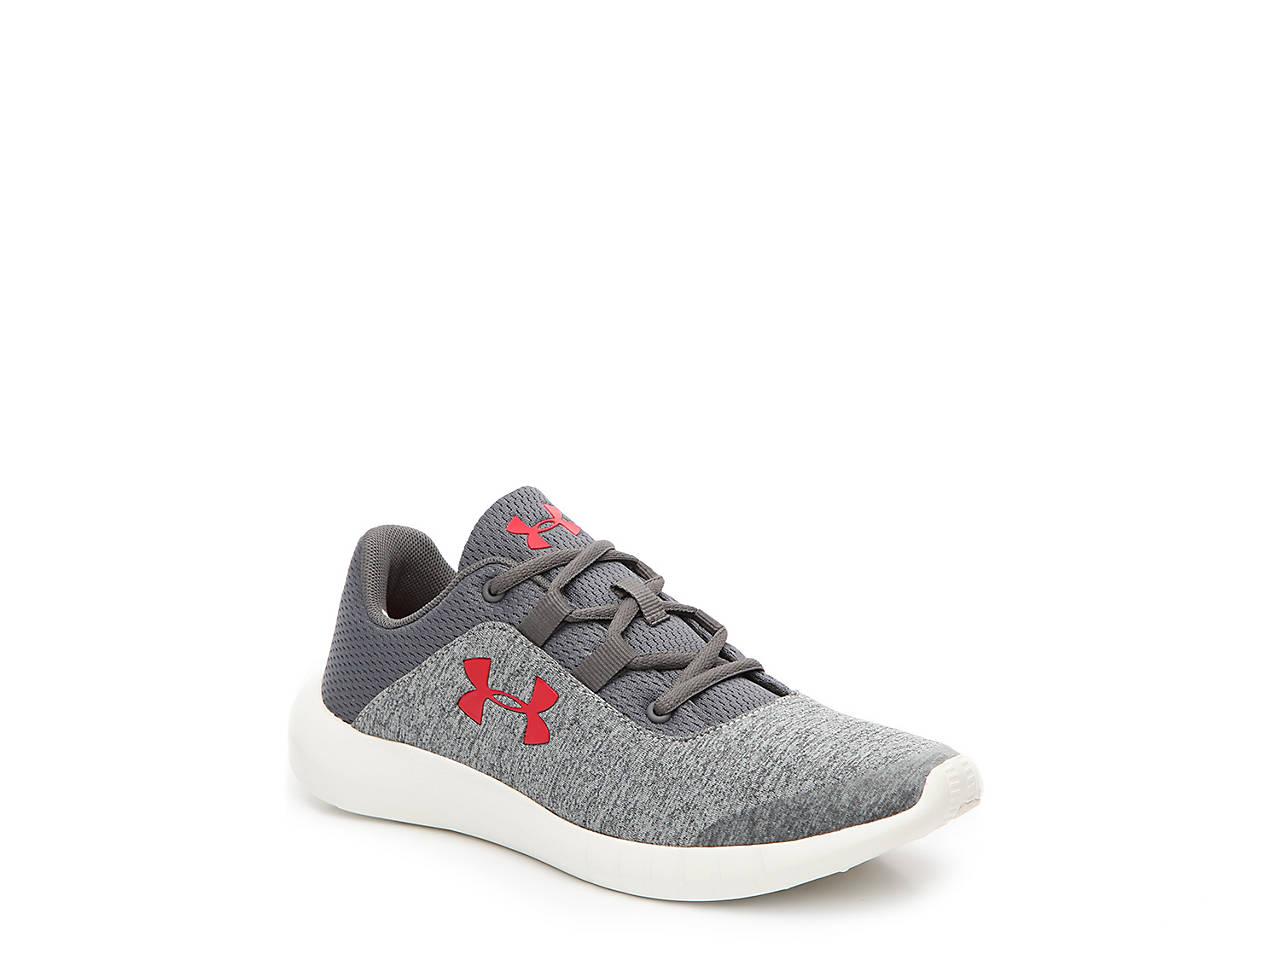 size 40 4d7ef 03bf6 Mojo Running Shoe - Kids'